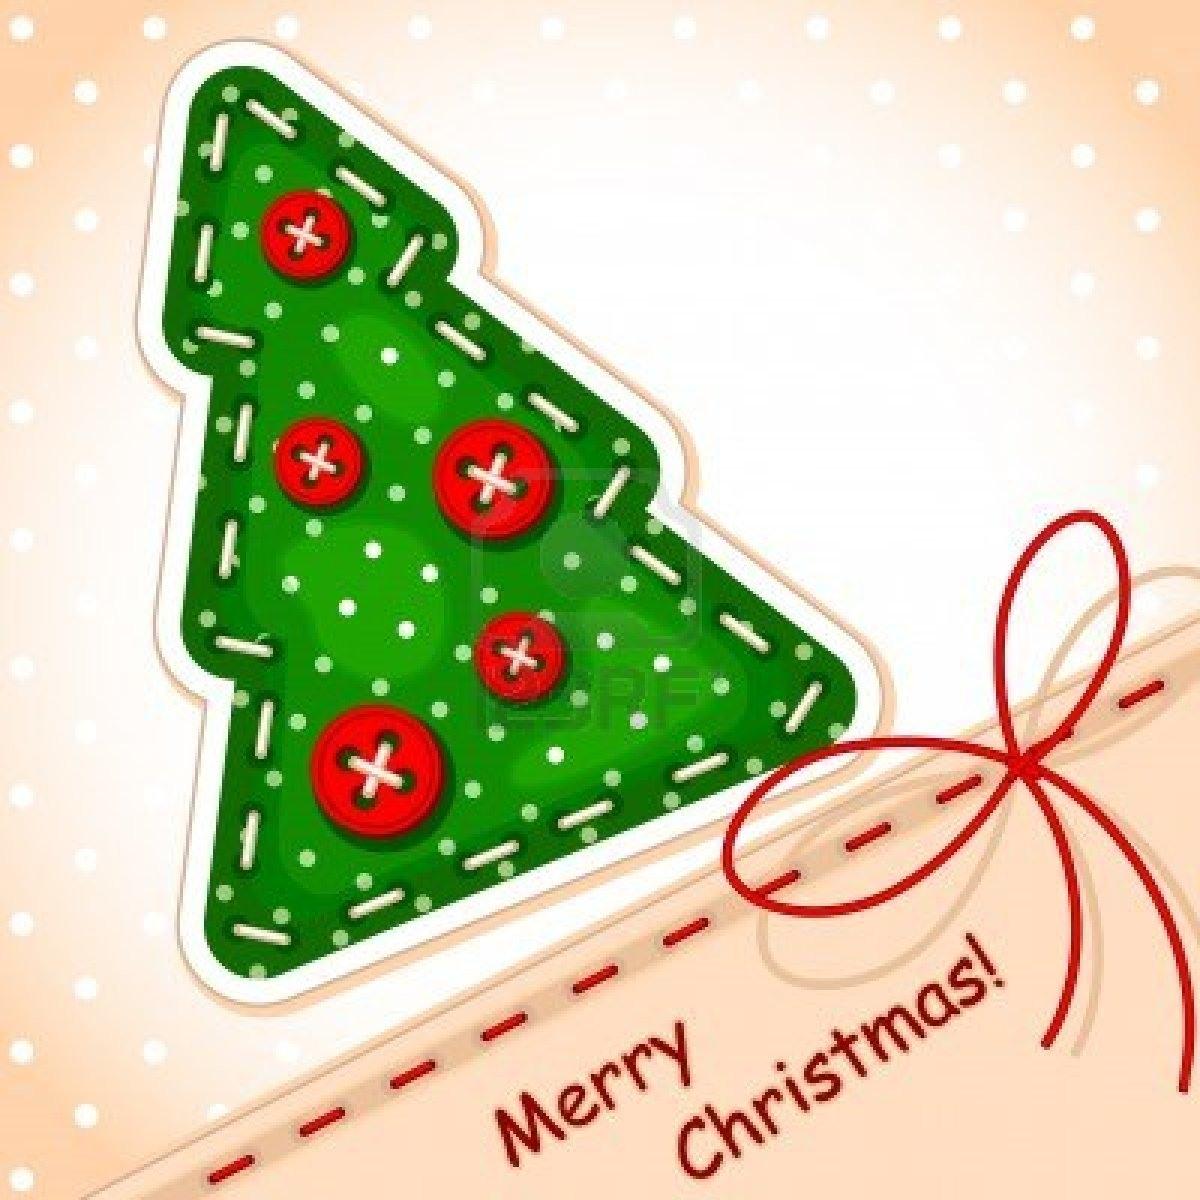 Immagini Natale Email.Immagini Di Natale Per Firma Email Immagini Di Natale